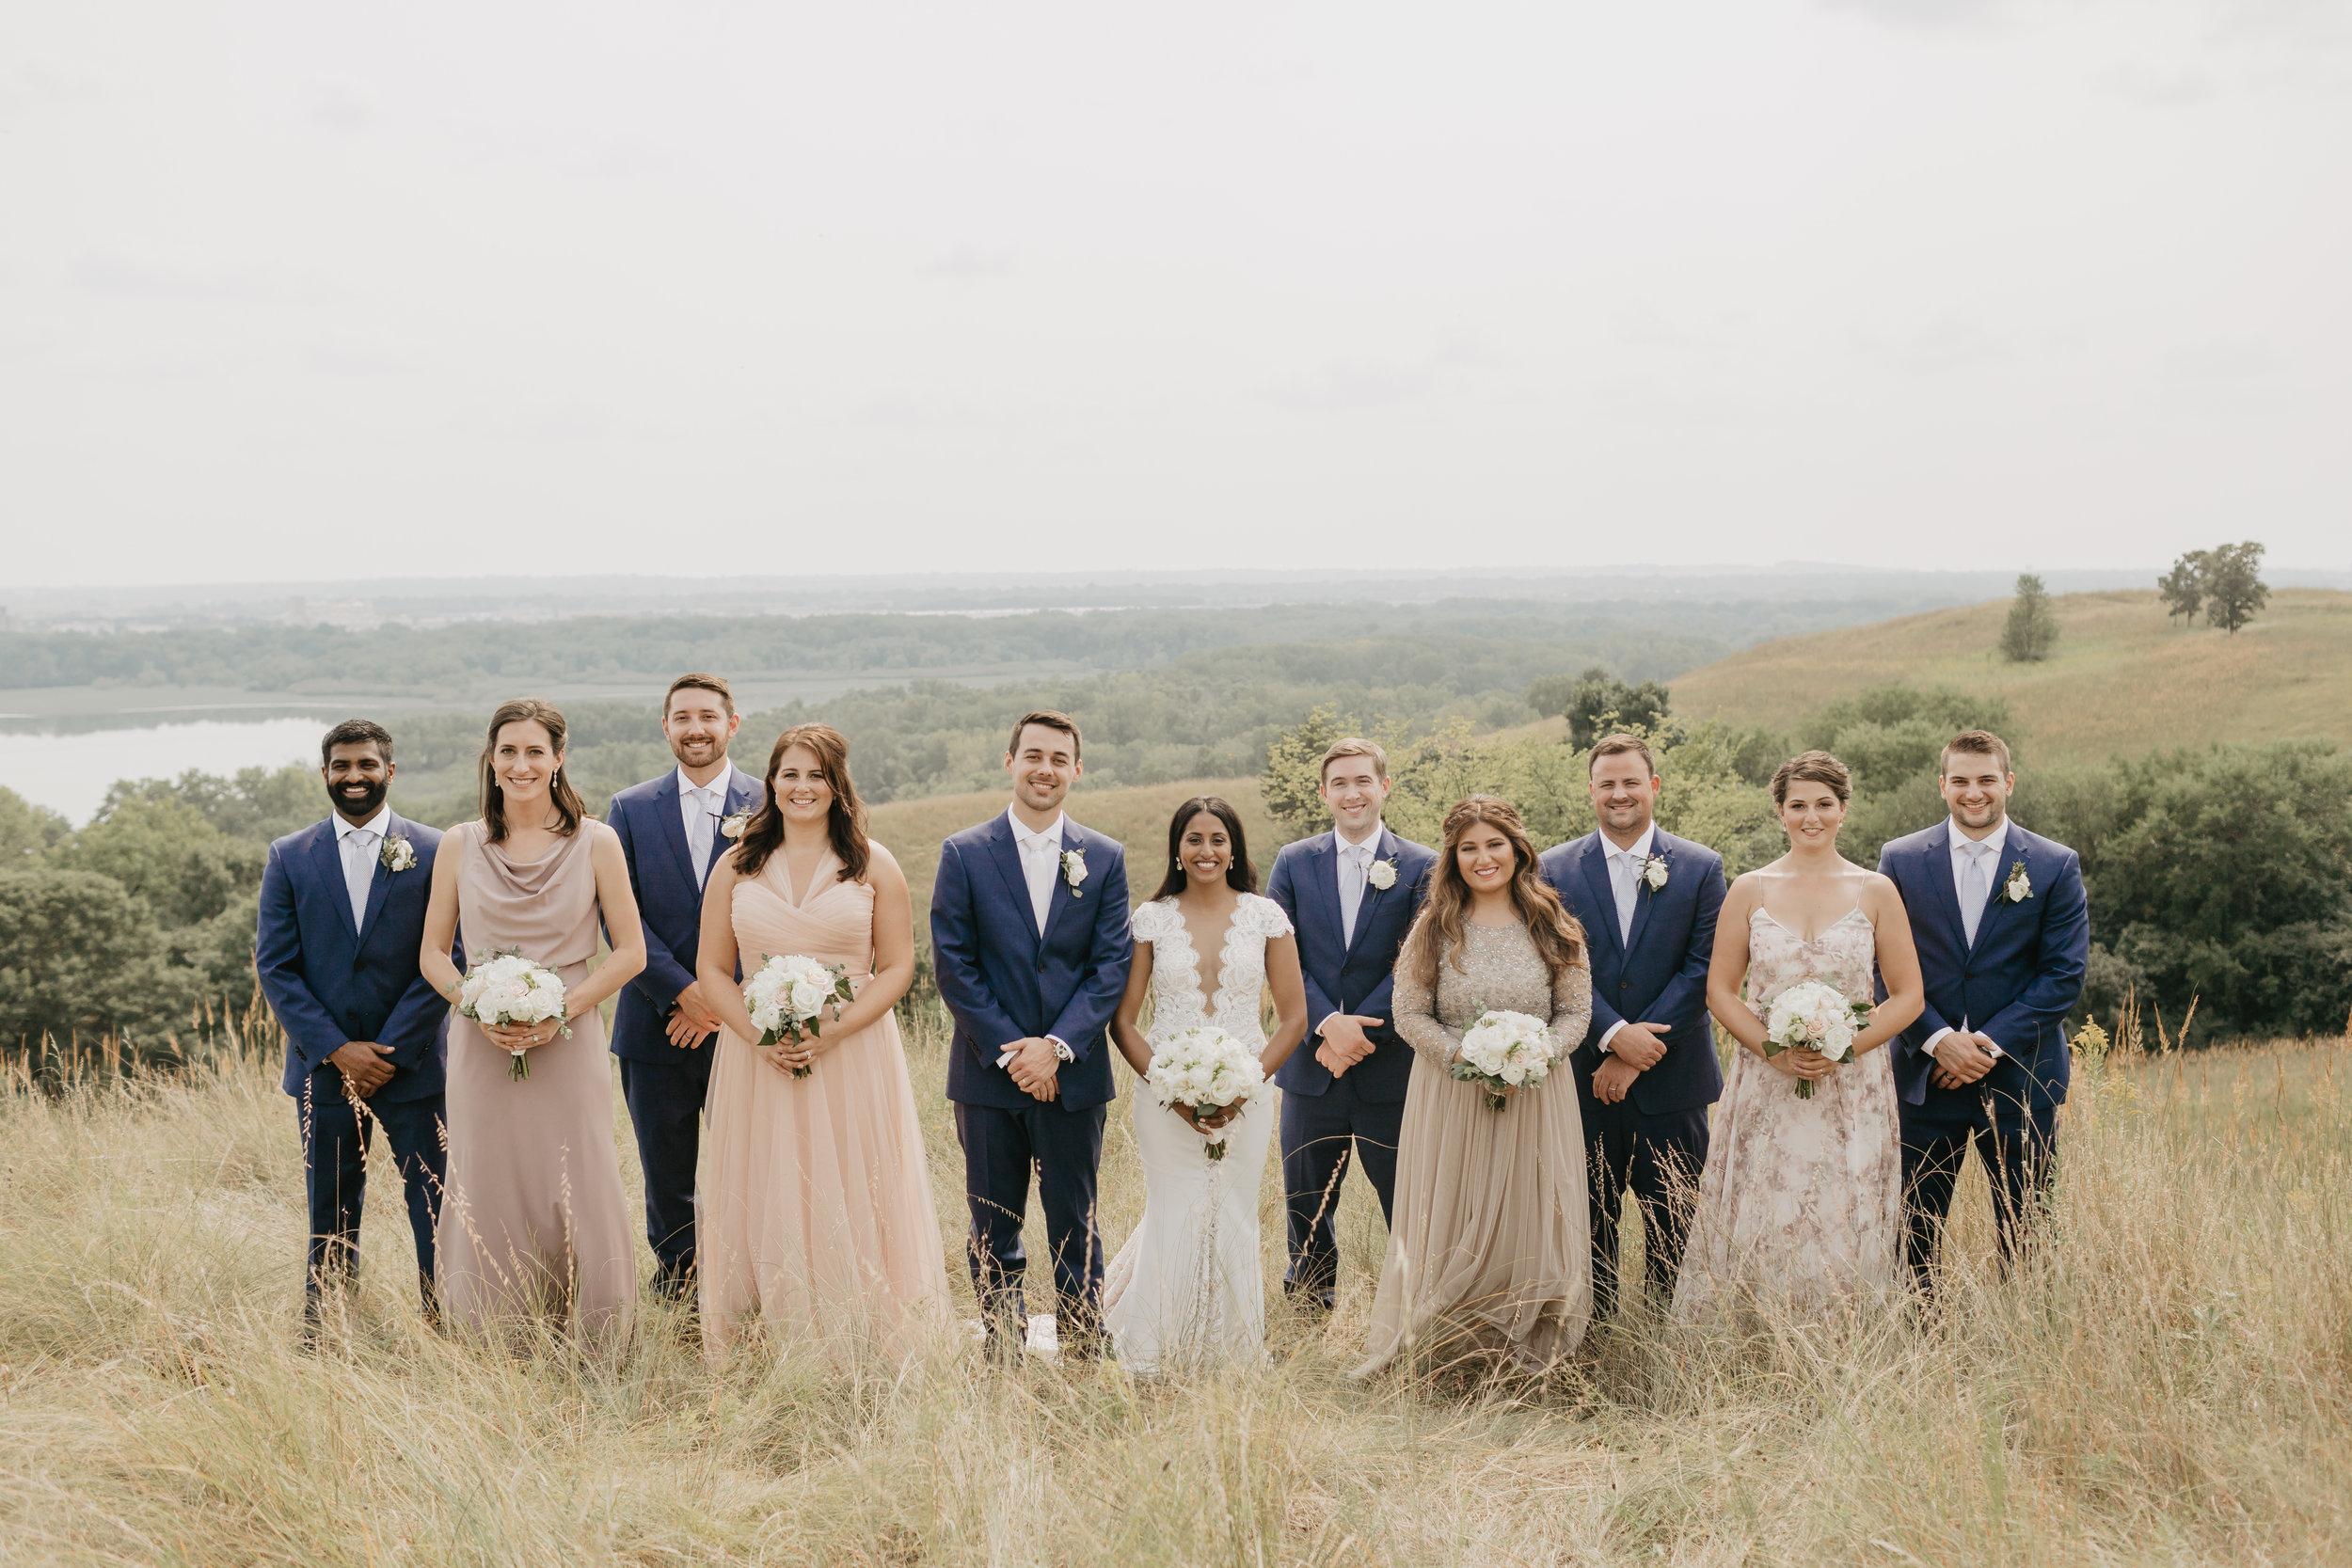 Bridal Party Kokal Photography